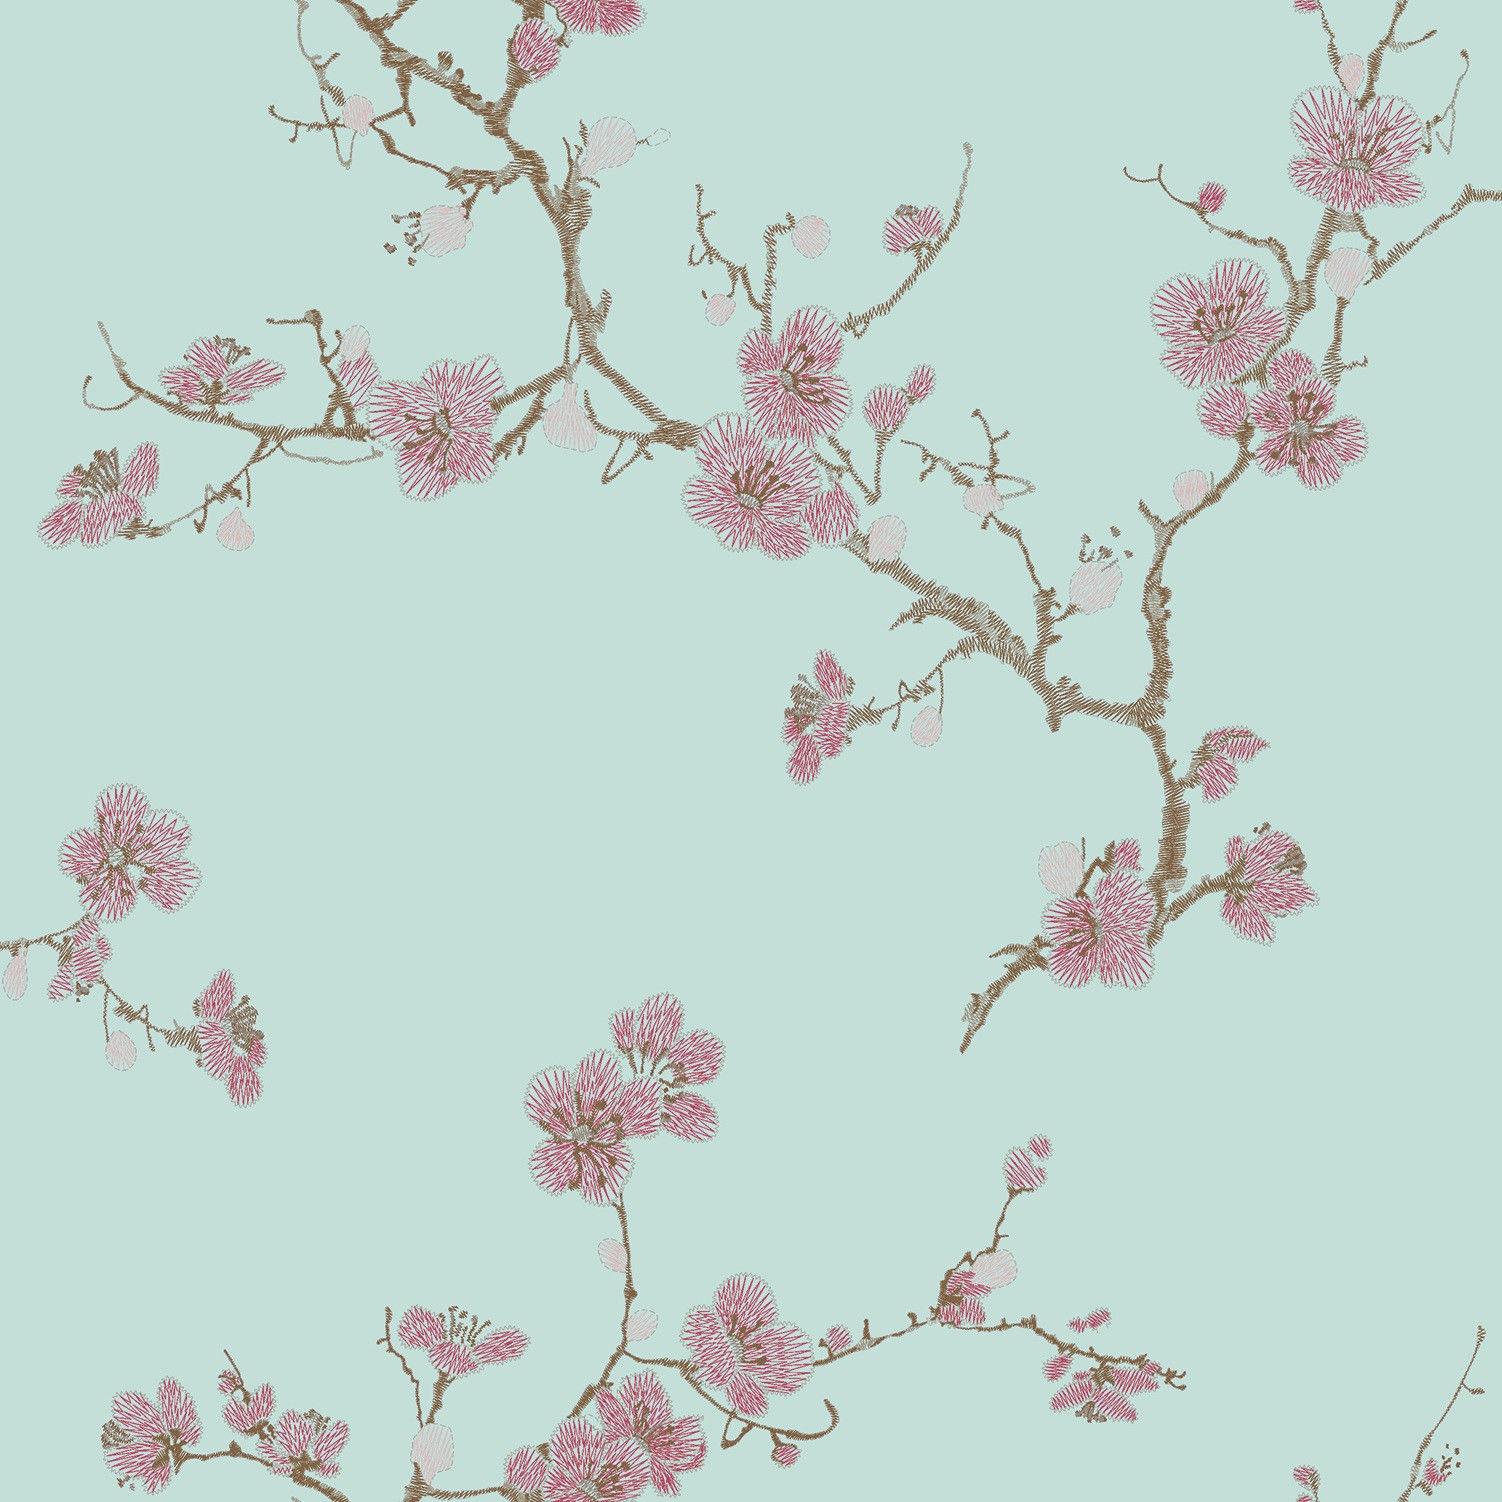 Flower Asian Style Textured Imitate Stitchwork Teal Wallpaper eBay 1502x1502